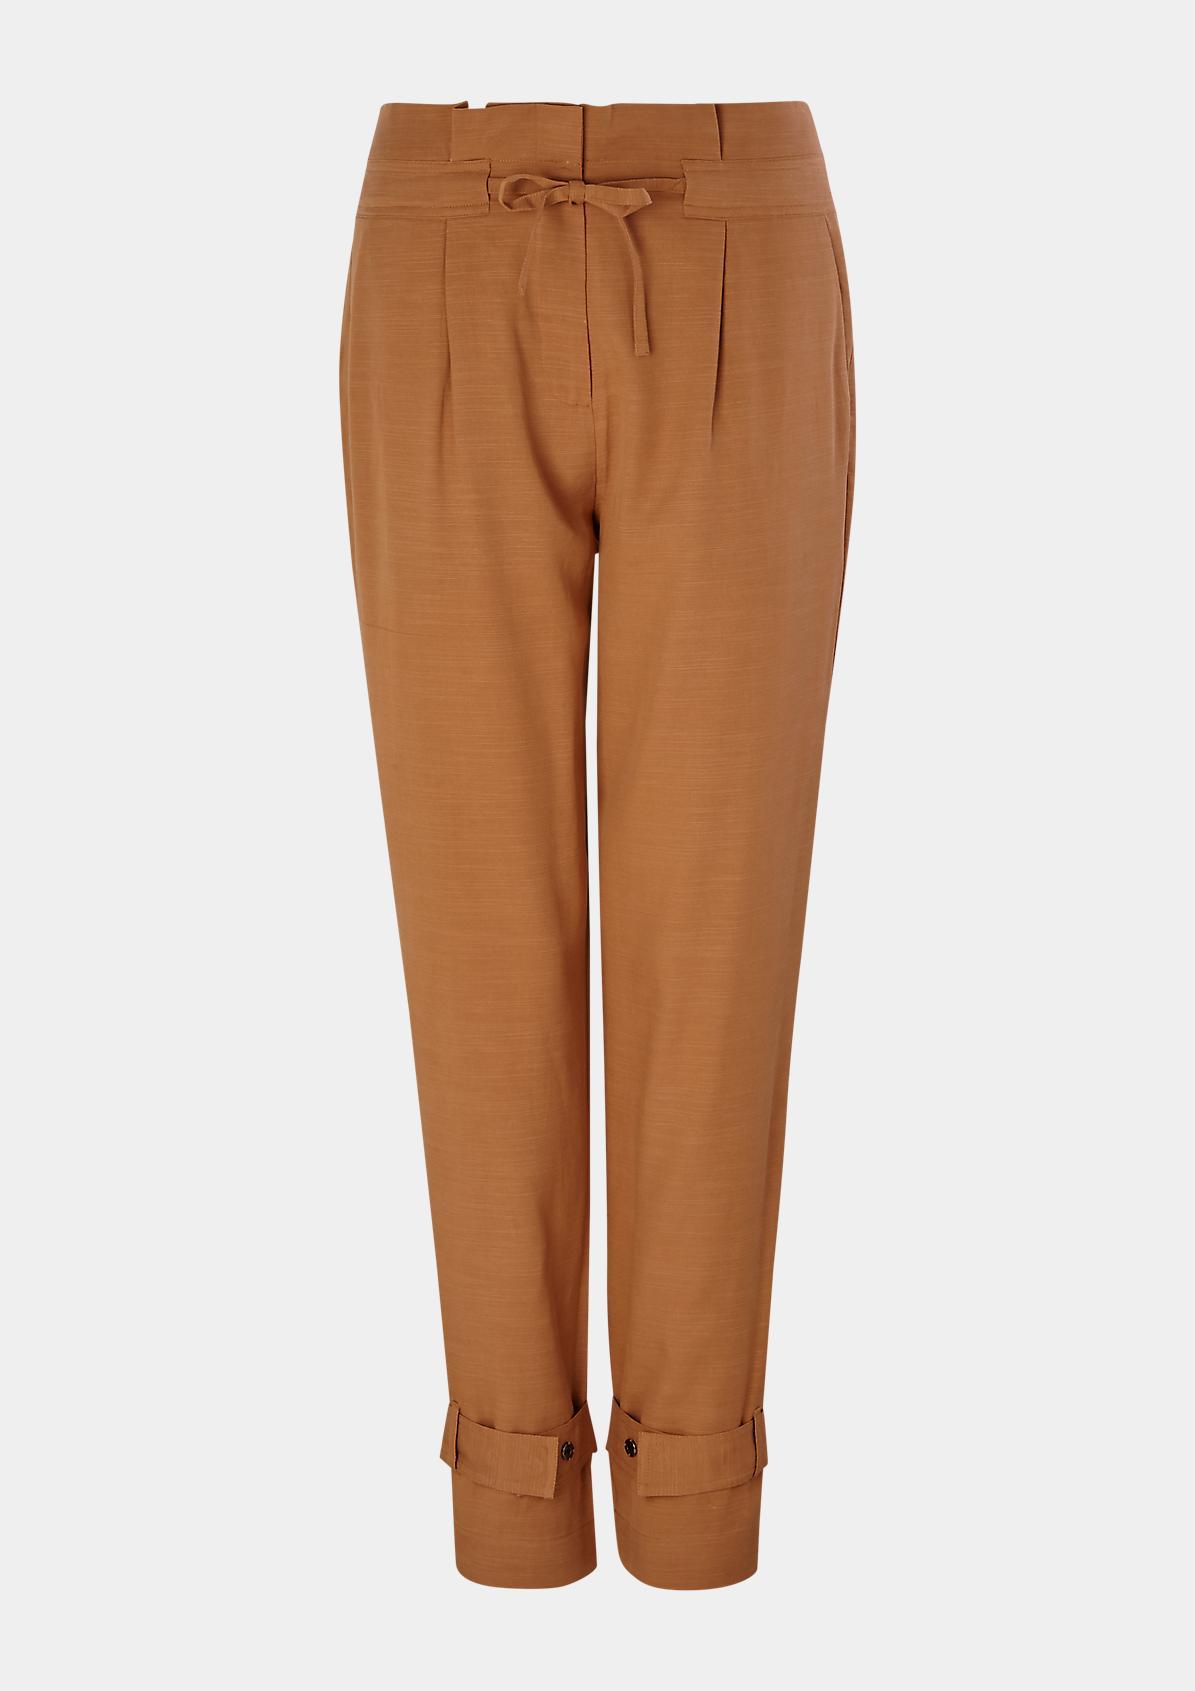 Regular Fit: Tapered leg-Hose